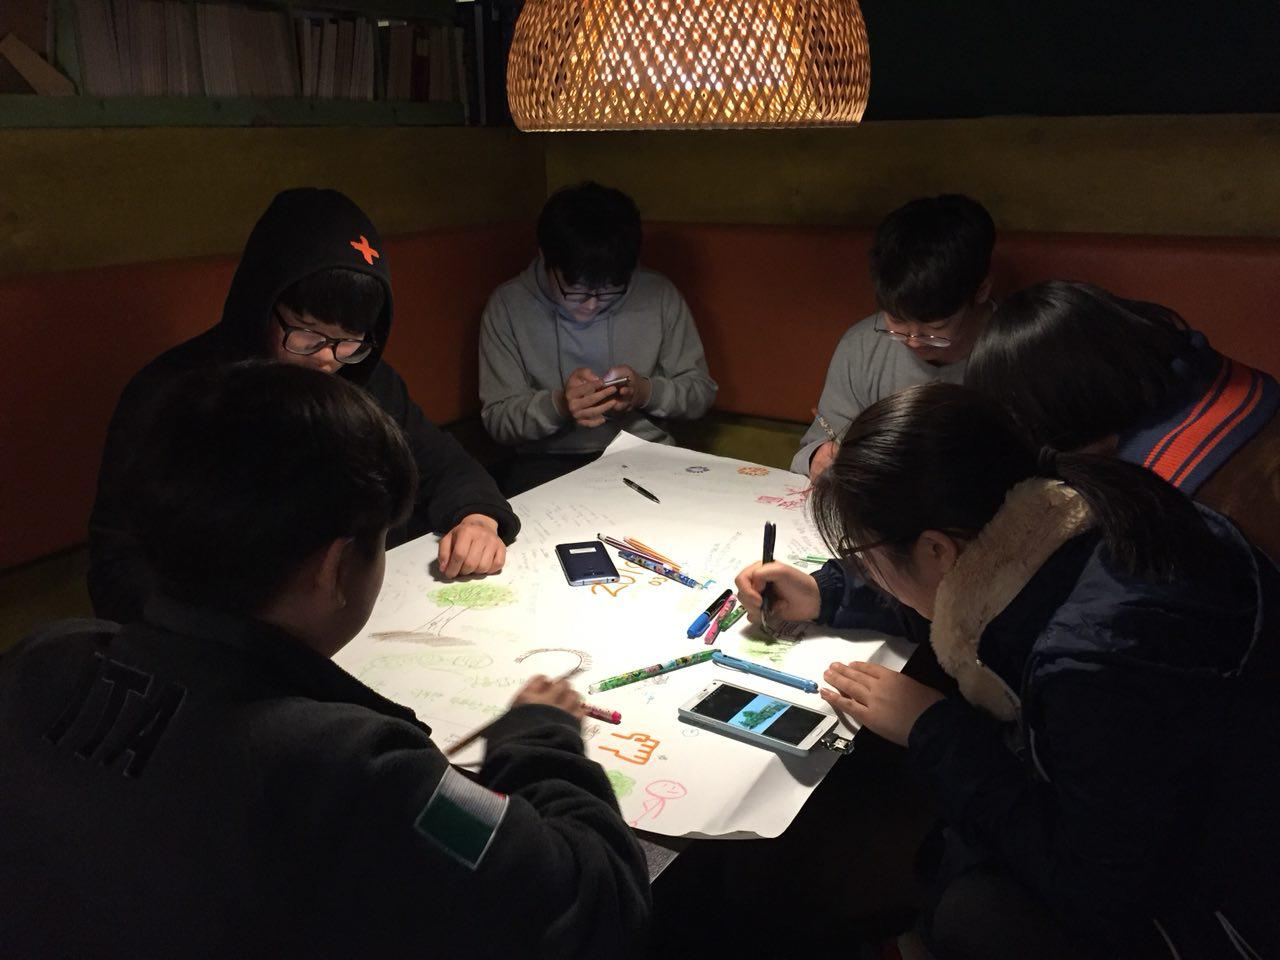 photo_2018-04-02_16-23-37.jpg